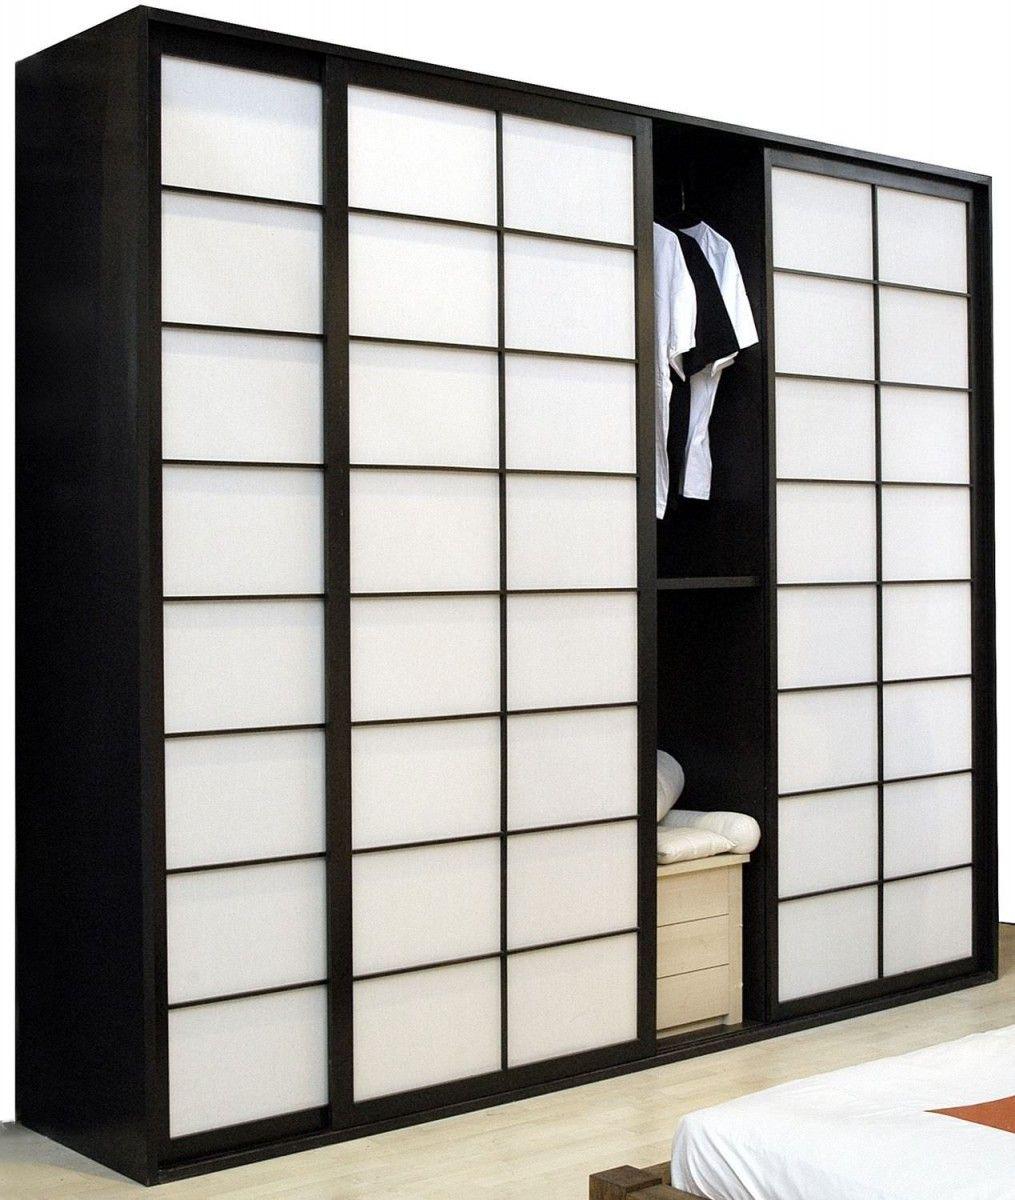 japanese shoji screens for sliding glass doors photo - 9